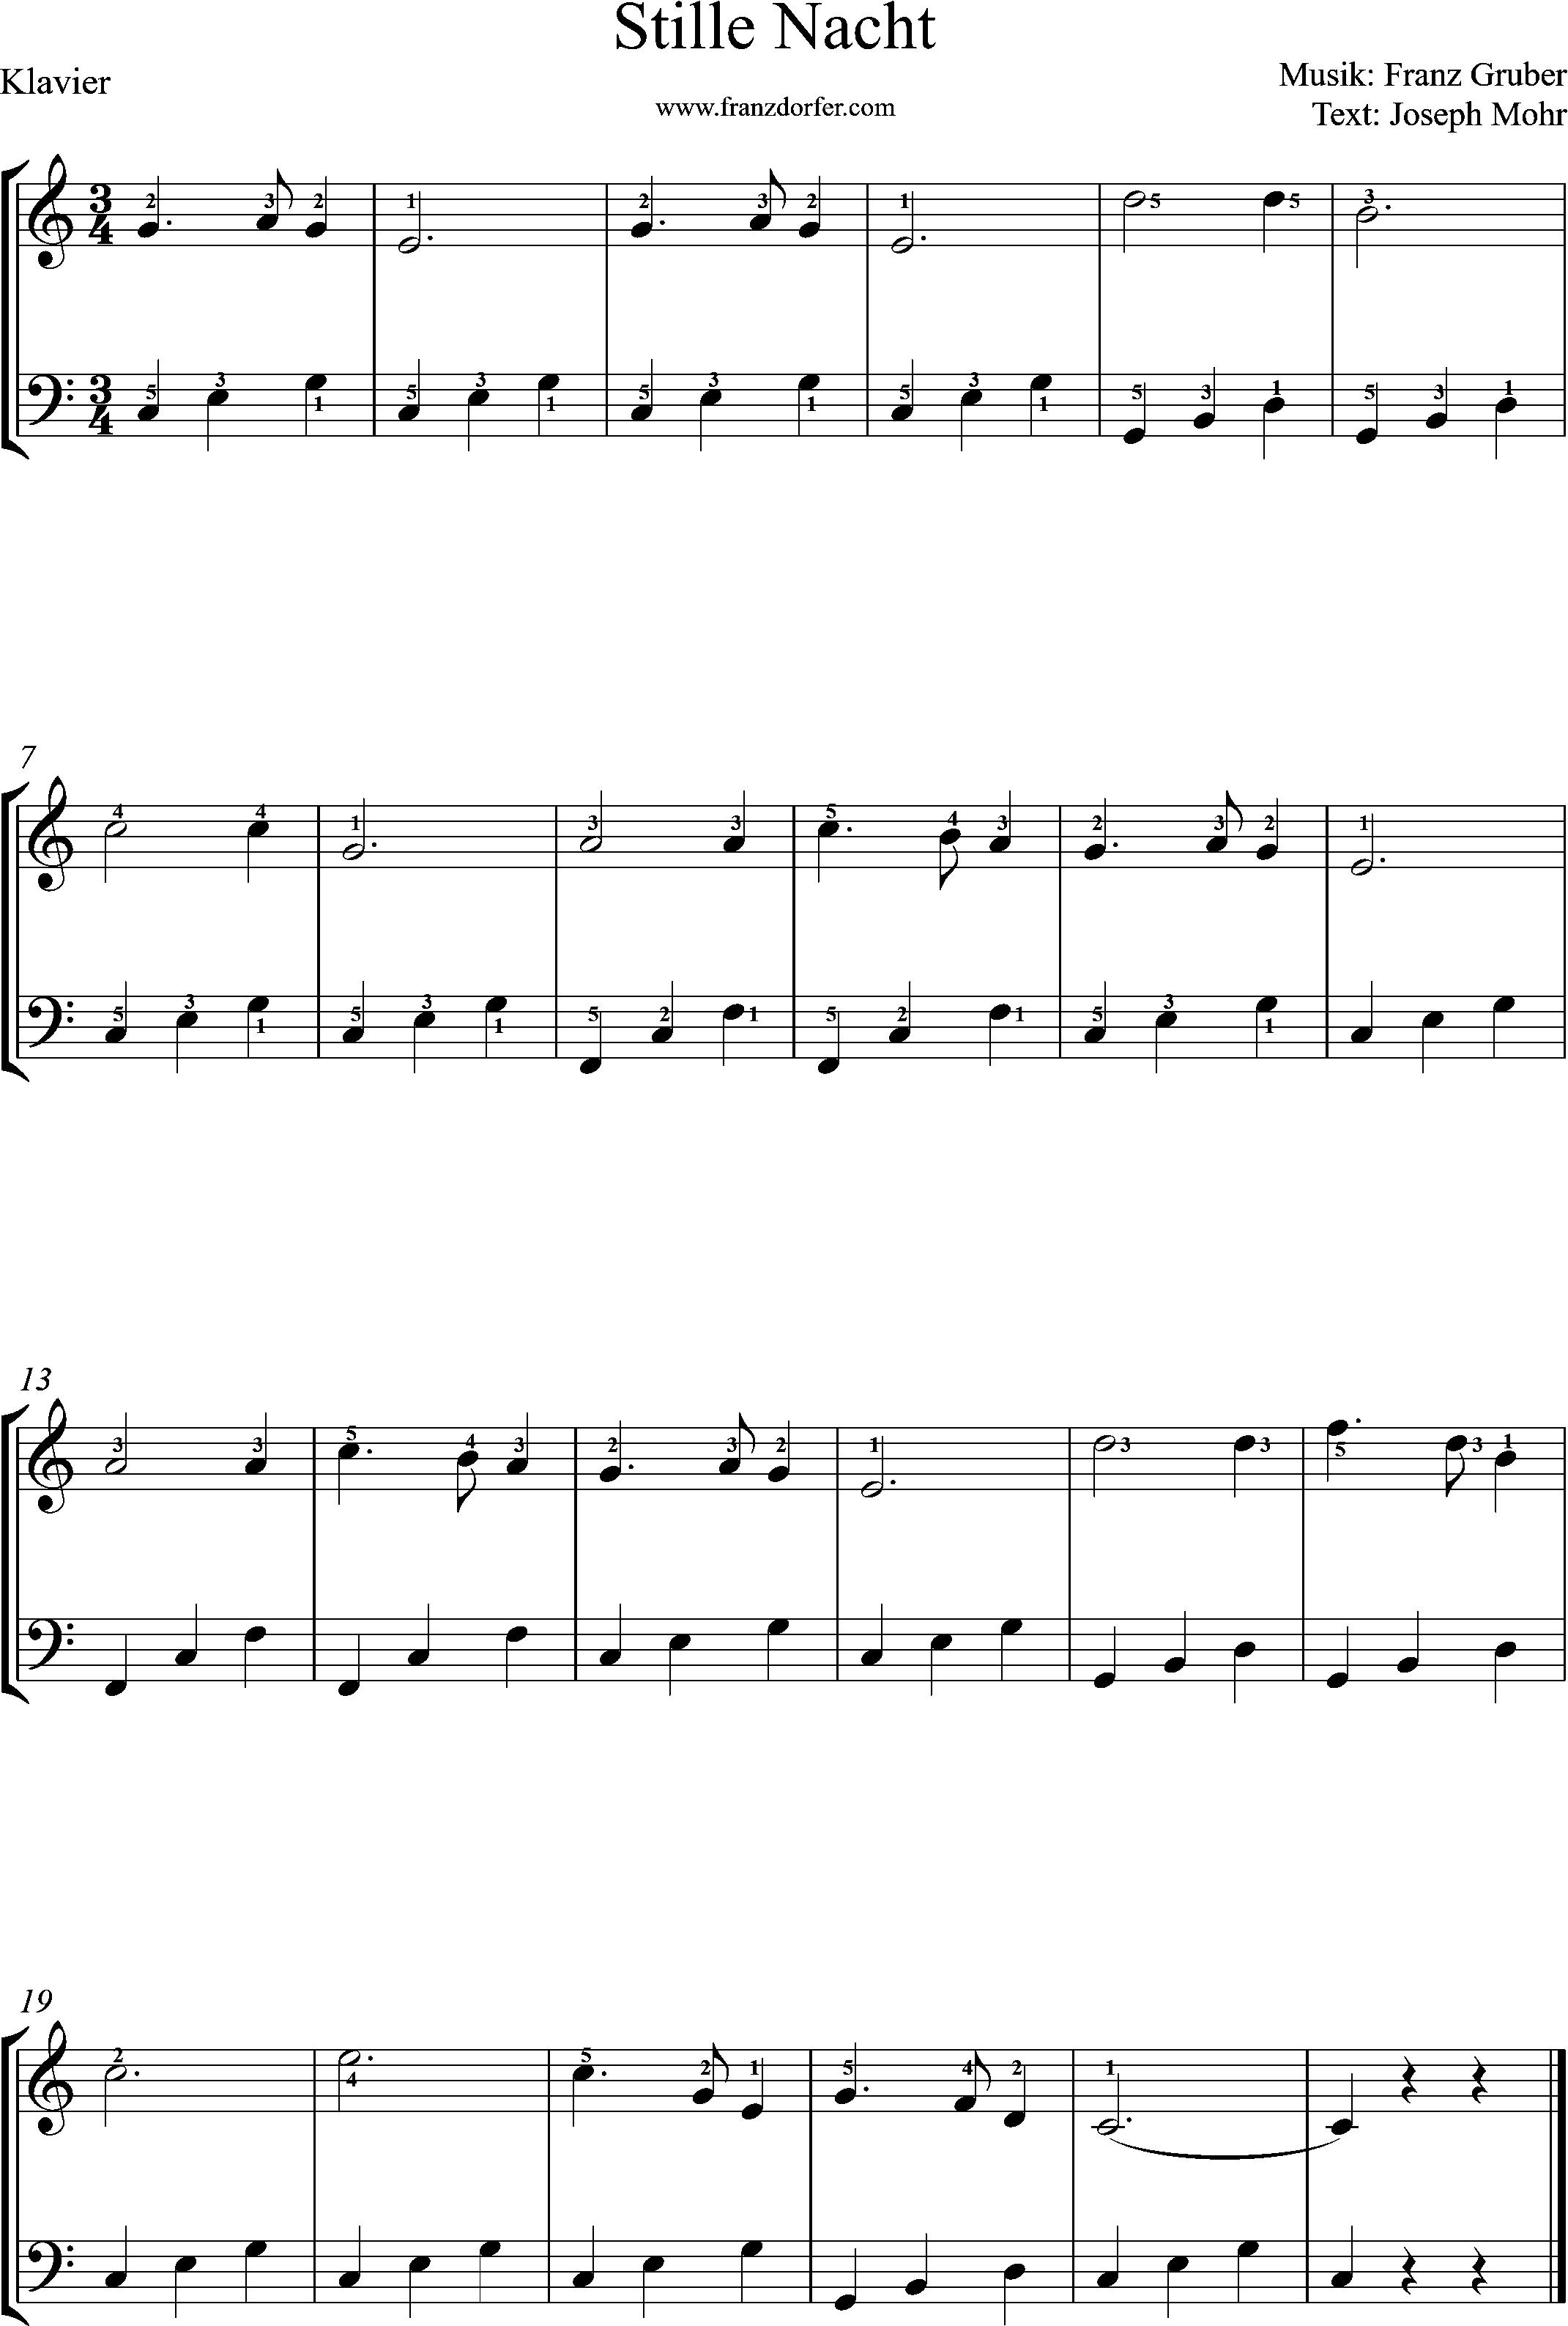 klaviernoten, Stille Nacht